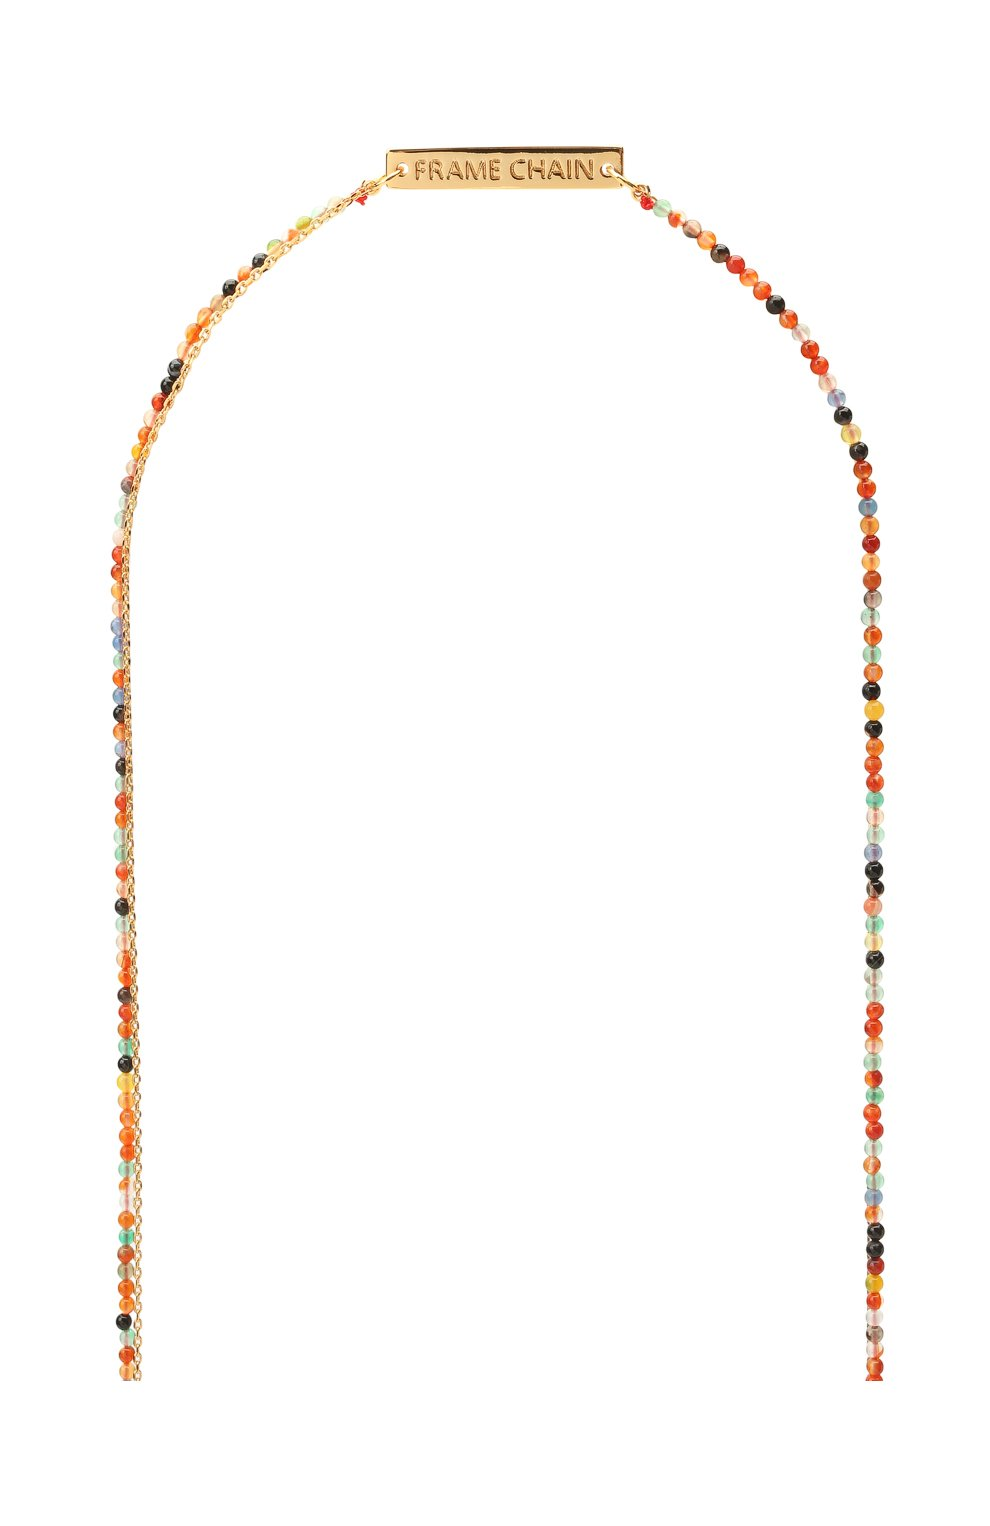 Женские цепочка для очков FRAME CHAIN разноцветного цвета, арт. IT`S A WRAP YELL0W G0LD   Фото 3 (Тип очков: Цепочка)